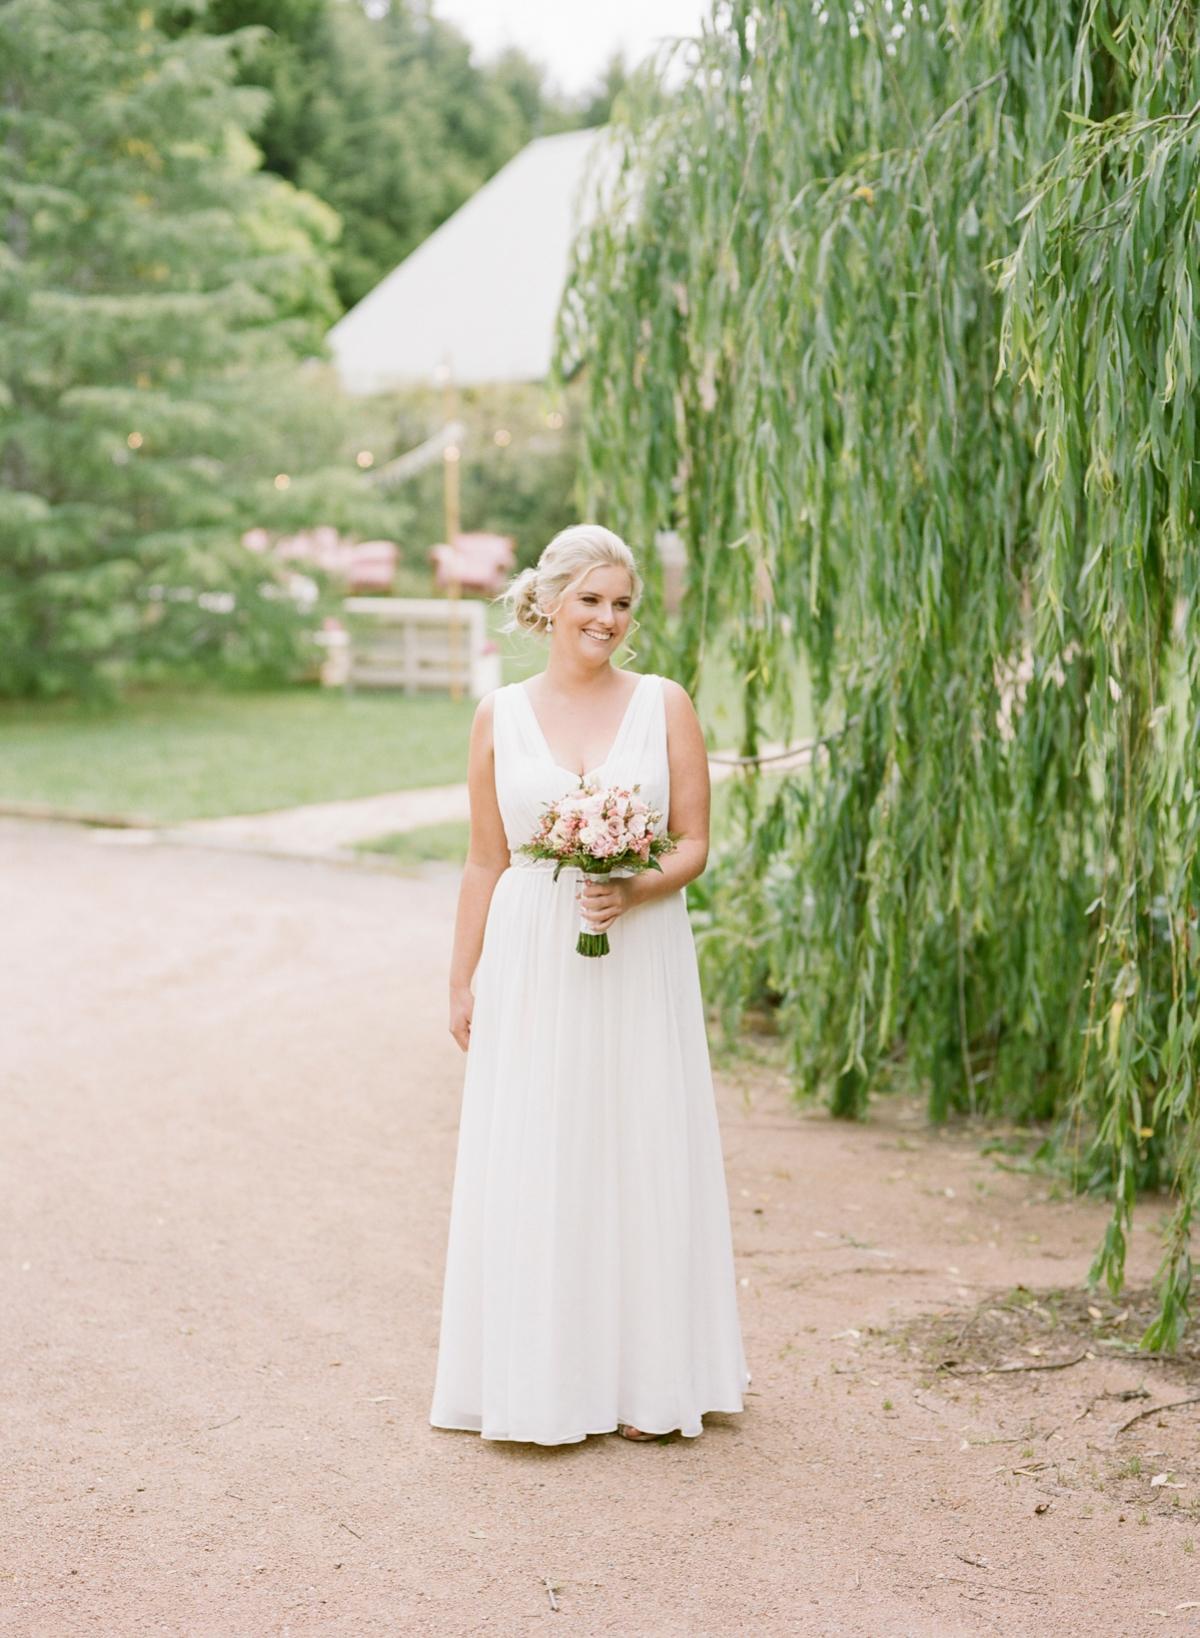 Monterose berry farm wedding by Mr Edwards Photography_0720.jpg